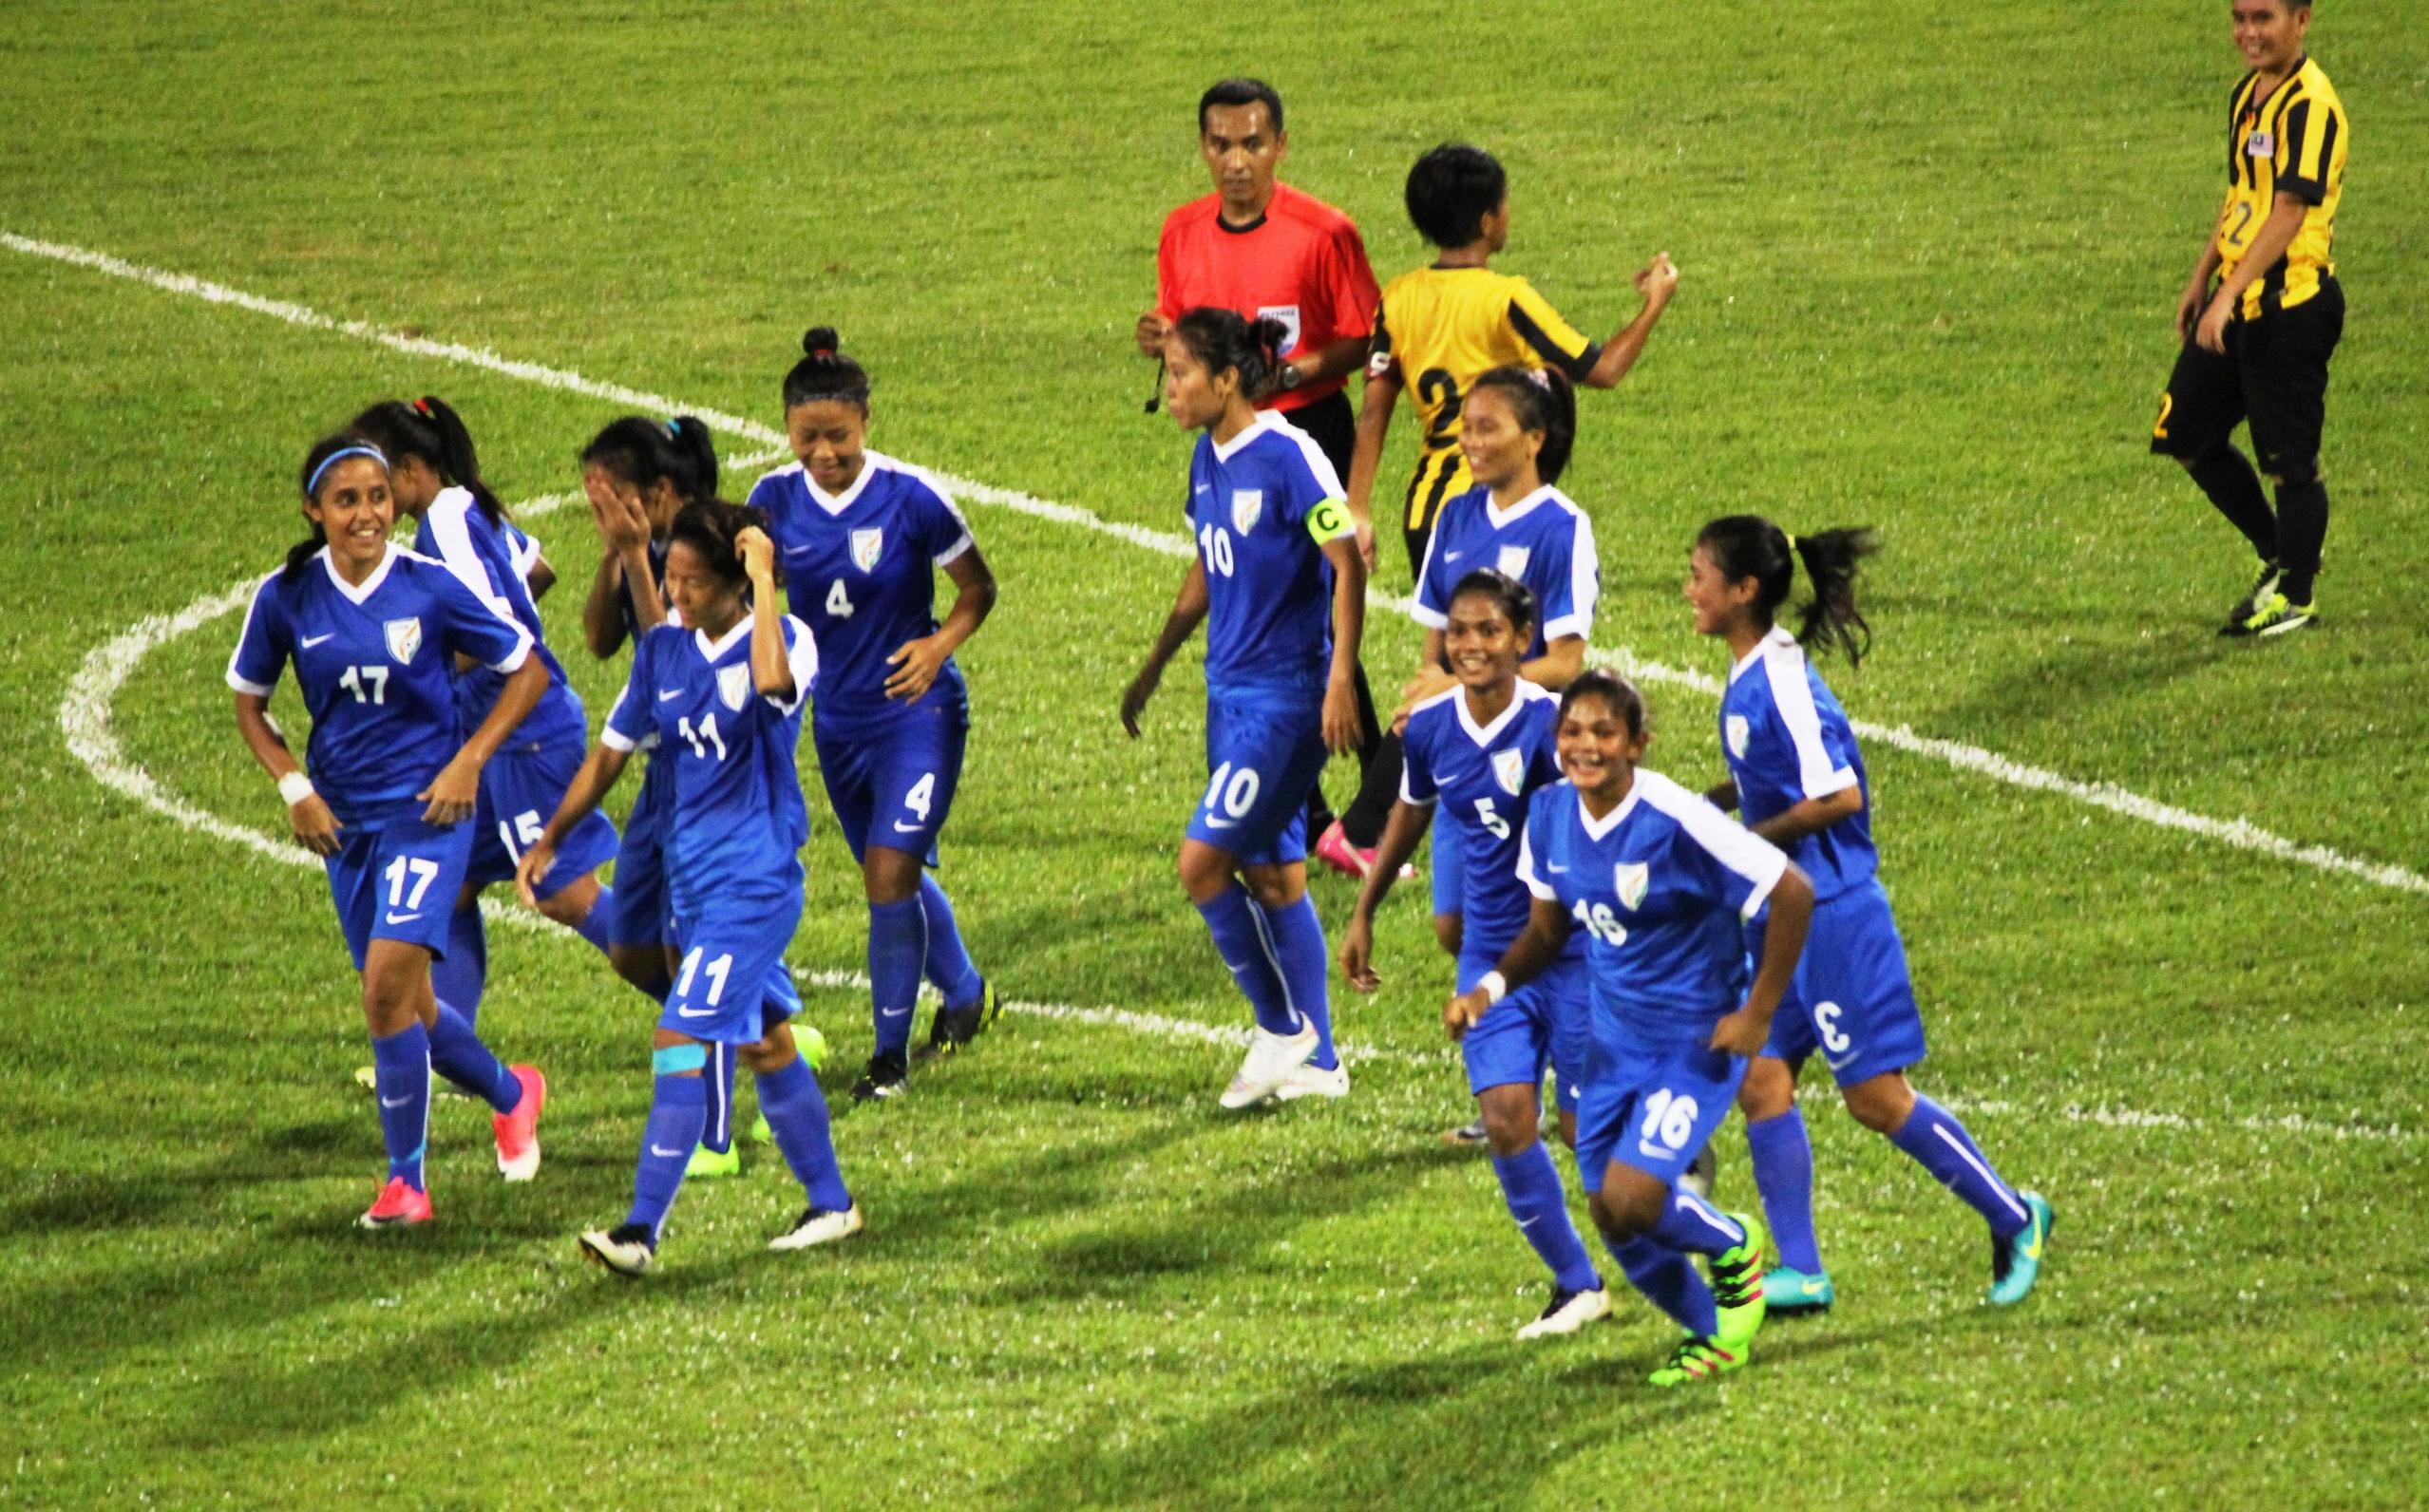 Malaysia India Womens Friendly 2017